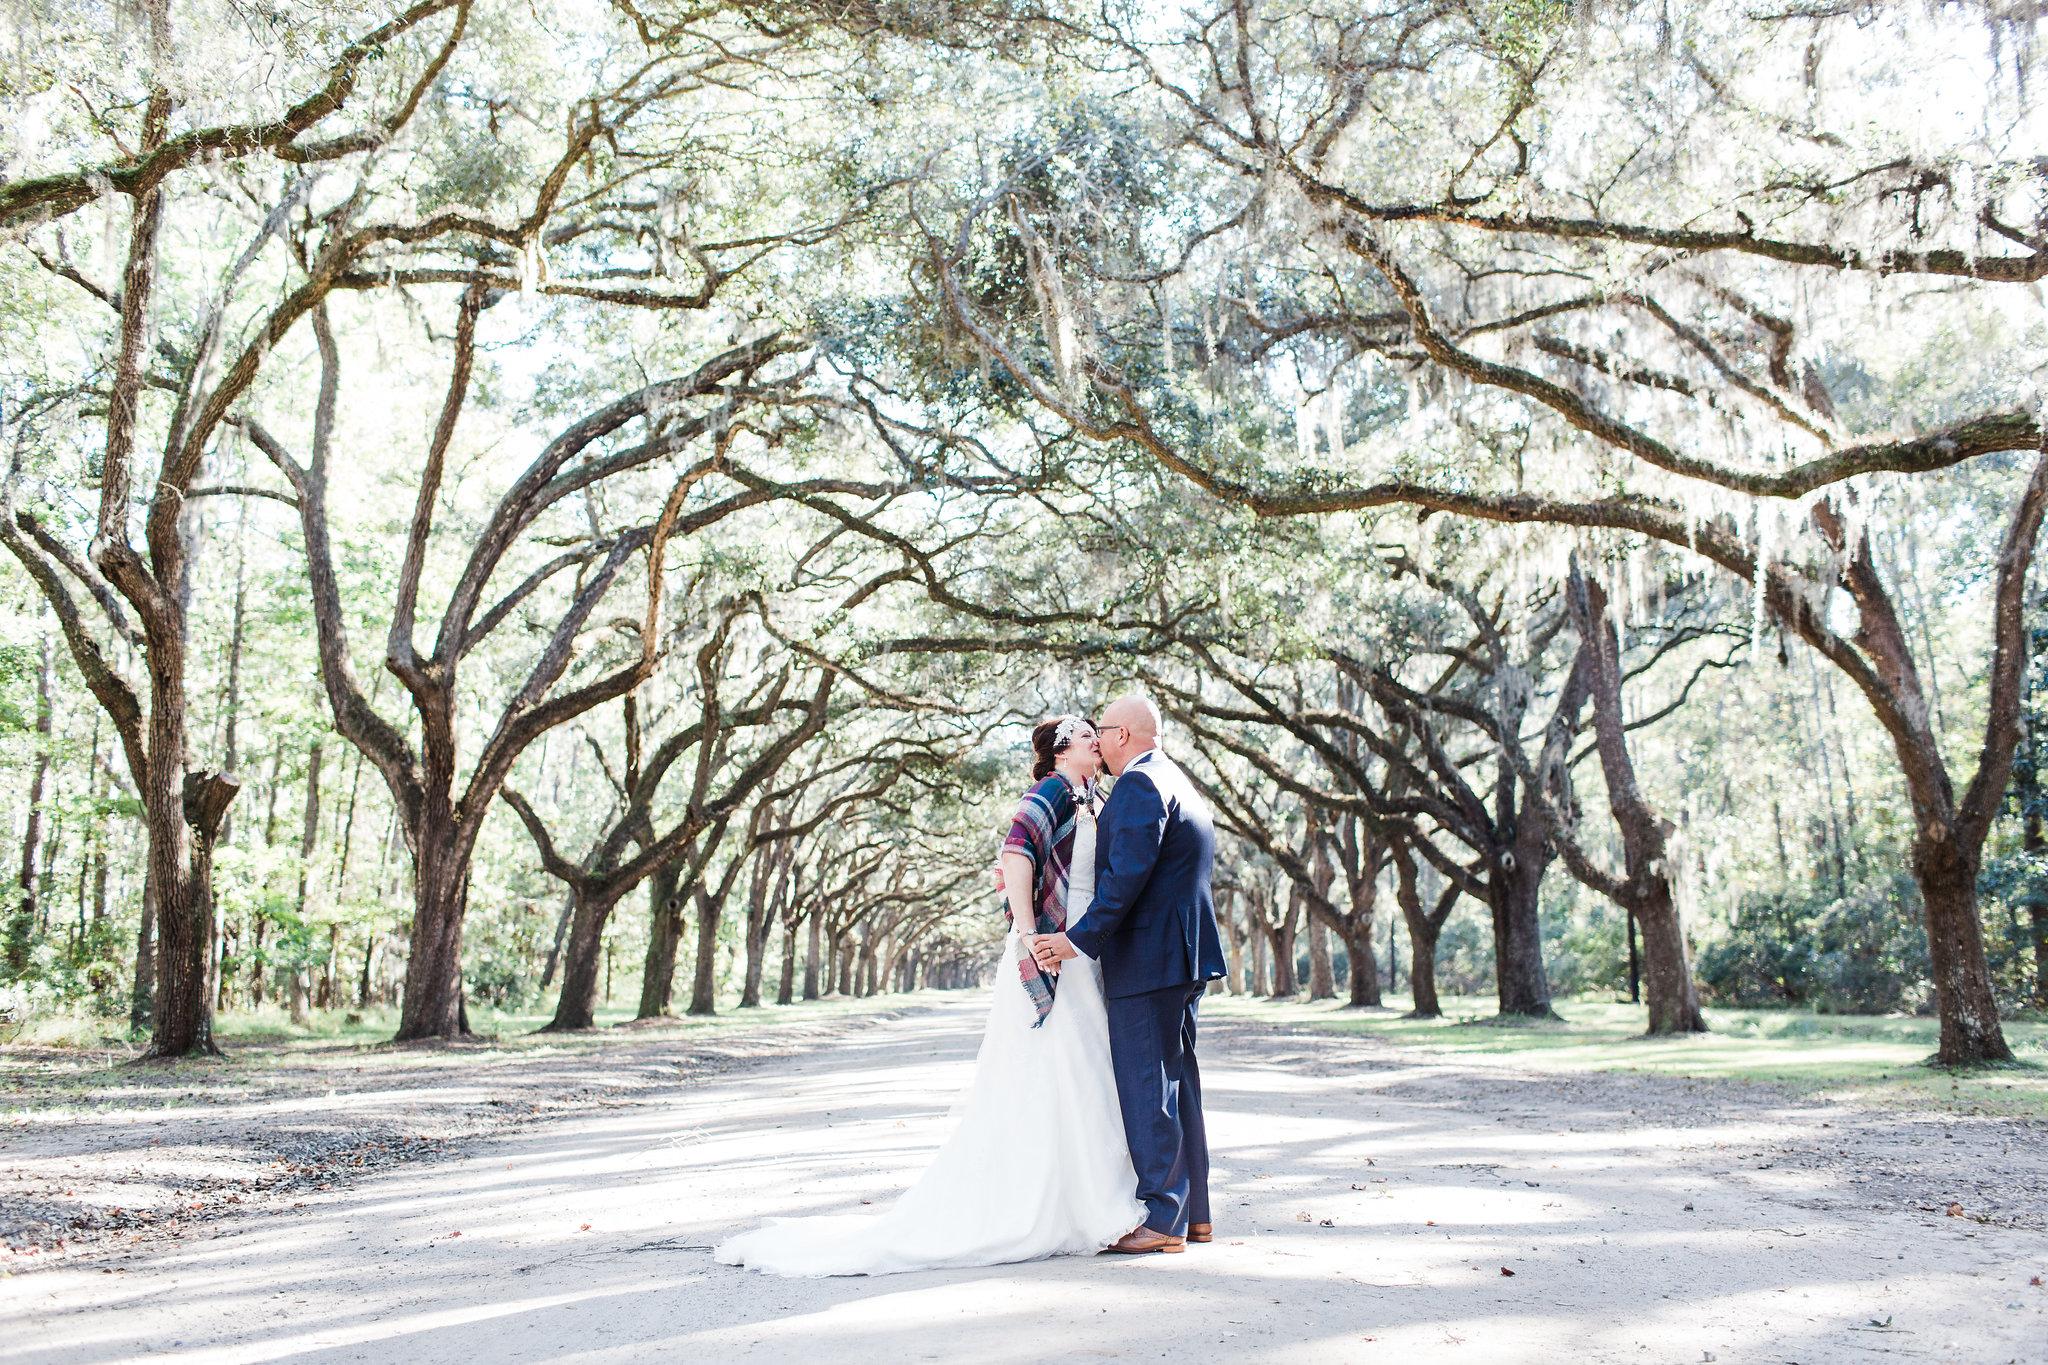 apt-b-photography-kristy-rob-wormsloe-elopment-savannah-wedding-photographer-savannah-elopement-wormsloe-wedding-historic-savannah-elopement-photographer-28.jpg